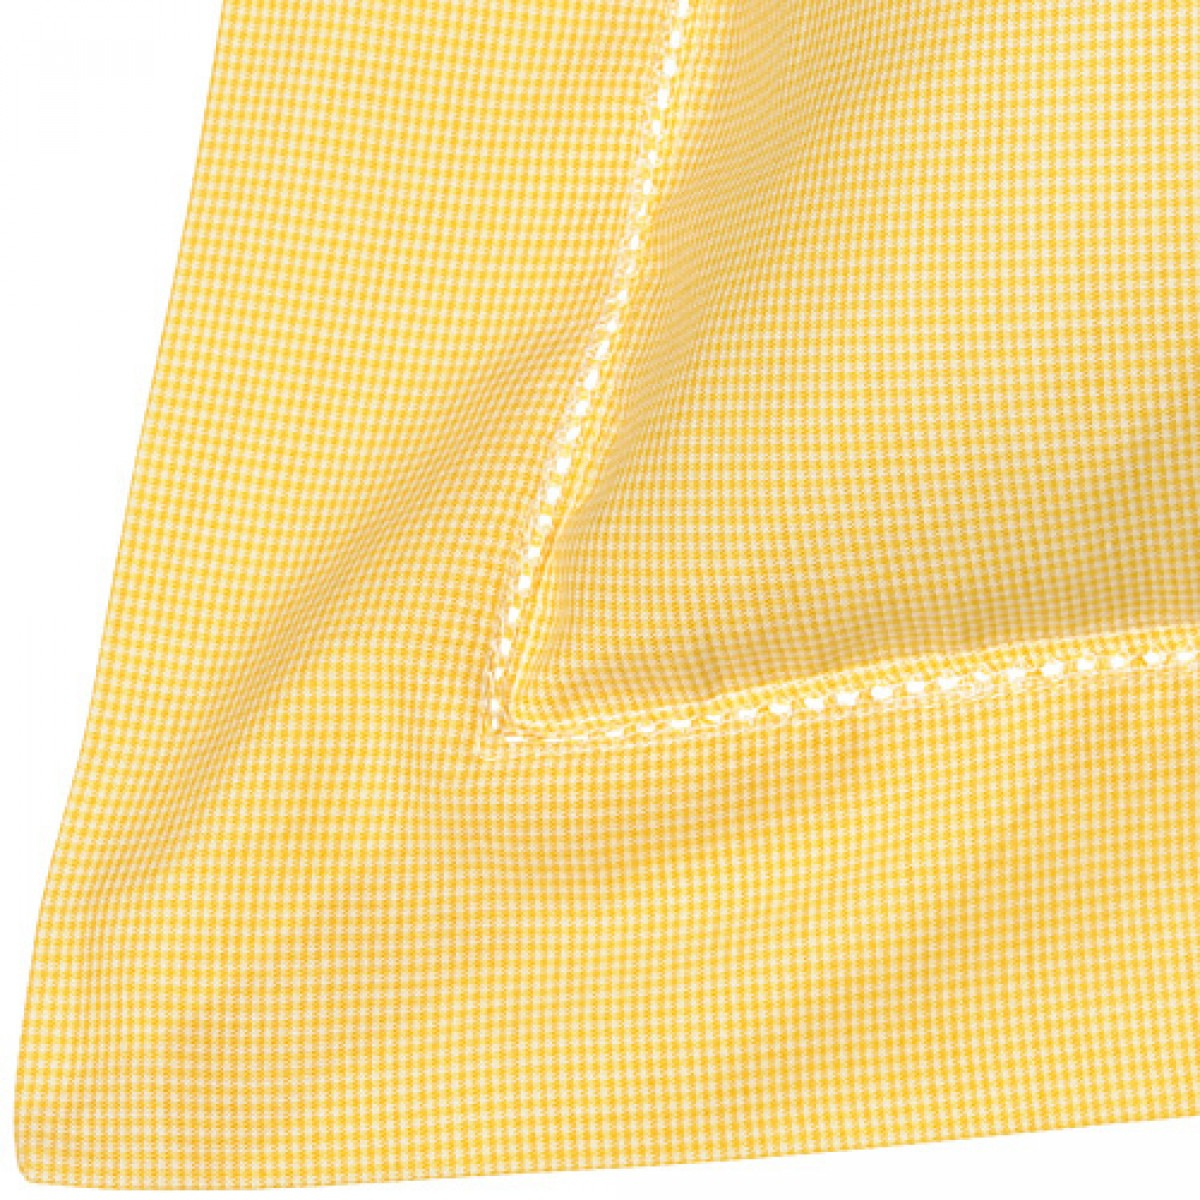 Yellow Dogtooth Cotton Bedlinen